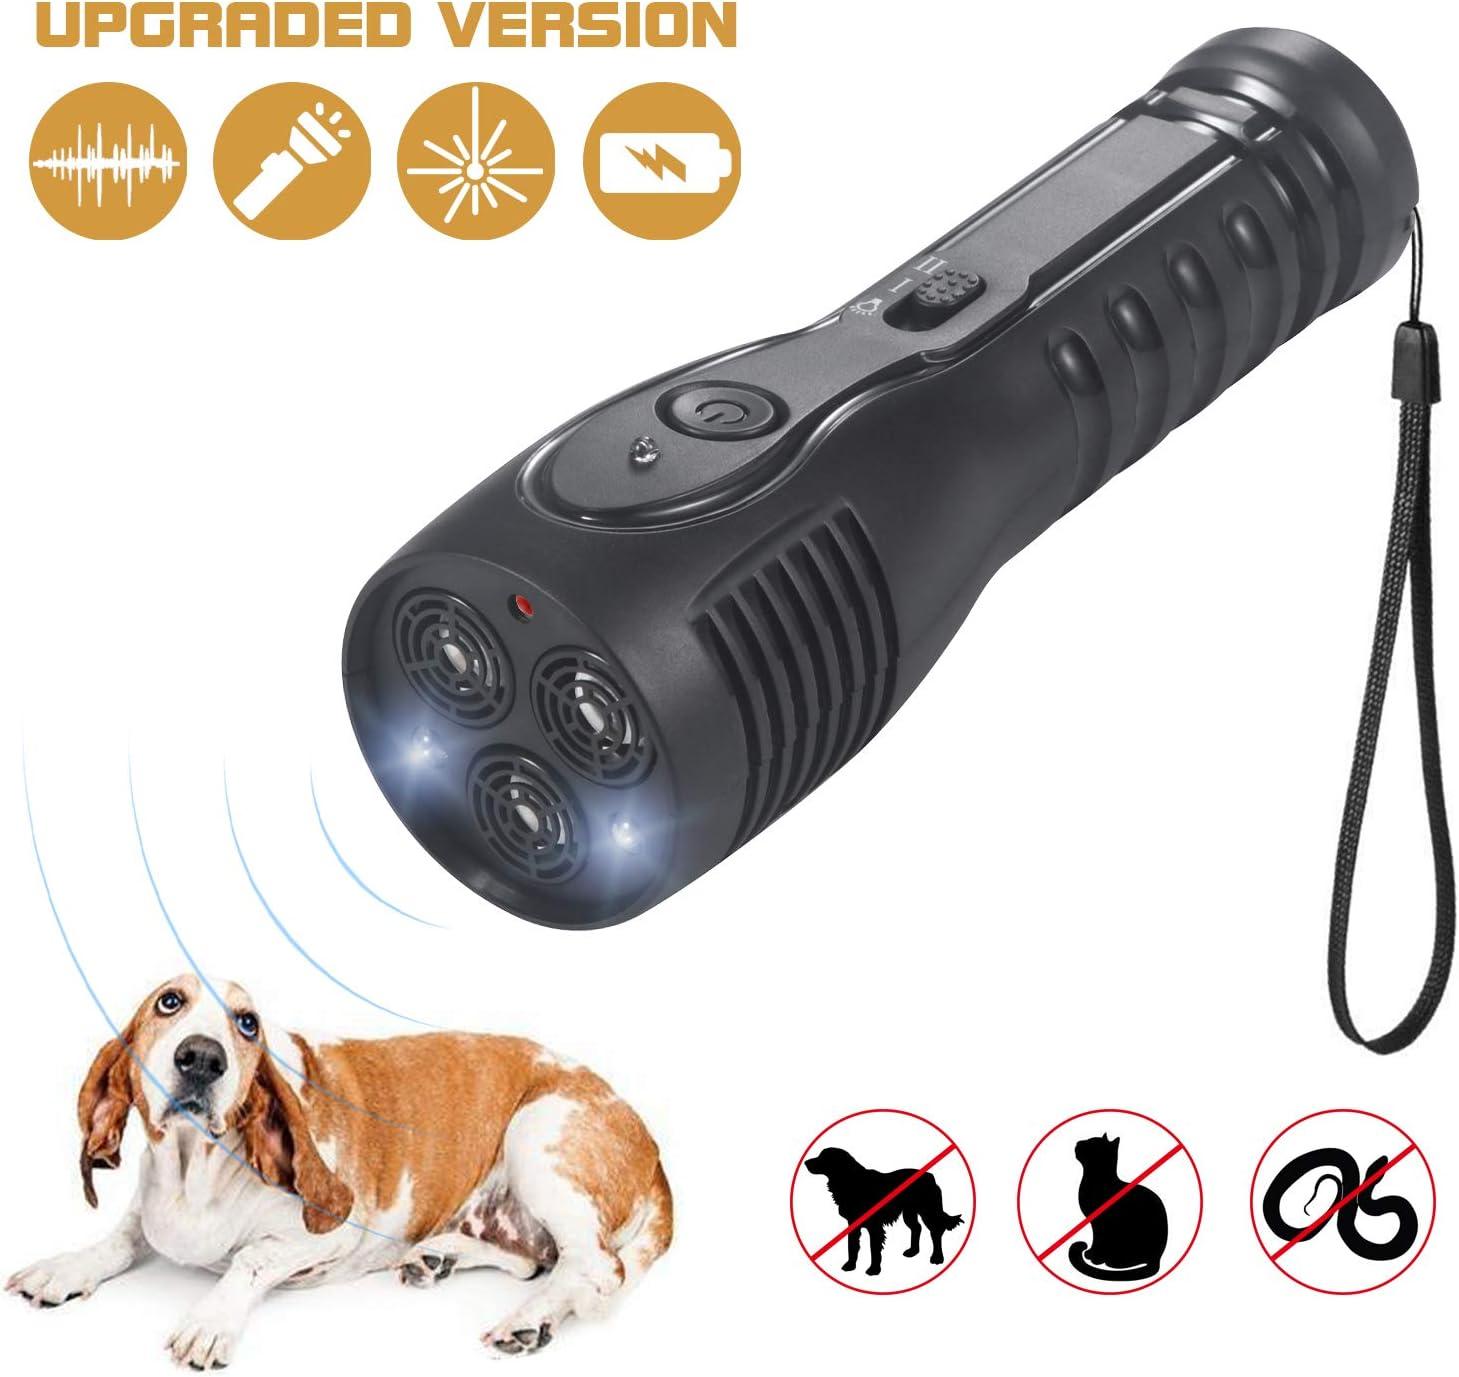 PetUlove Handheld Ultrasonic Dog Repeller, Dog Bark Deterrent Rechargeable with LED Flashlight Infrared Anti Barking Device Good Behavior Dog Training